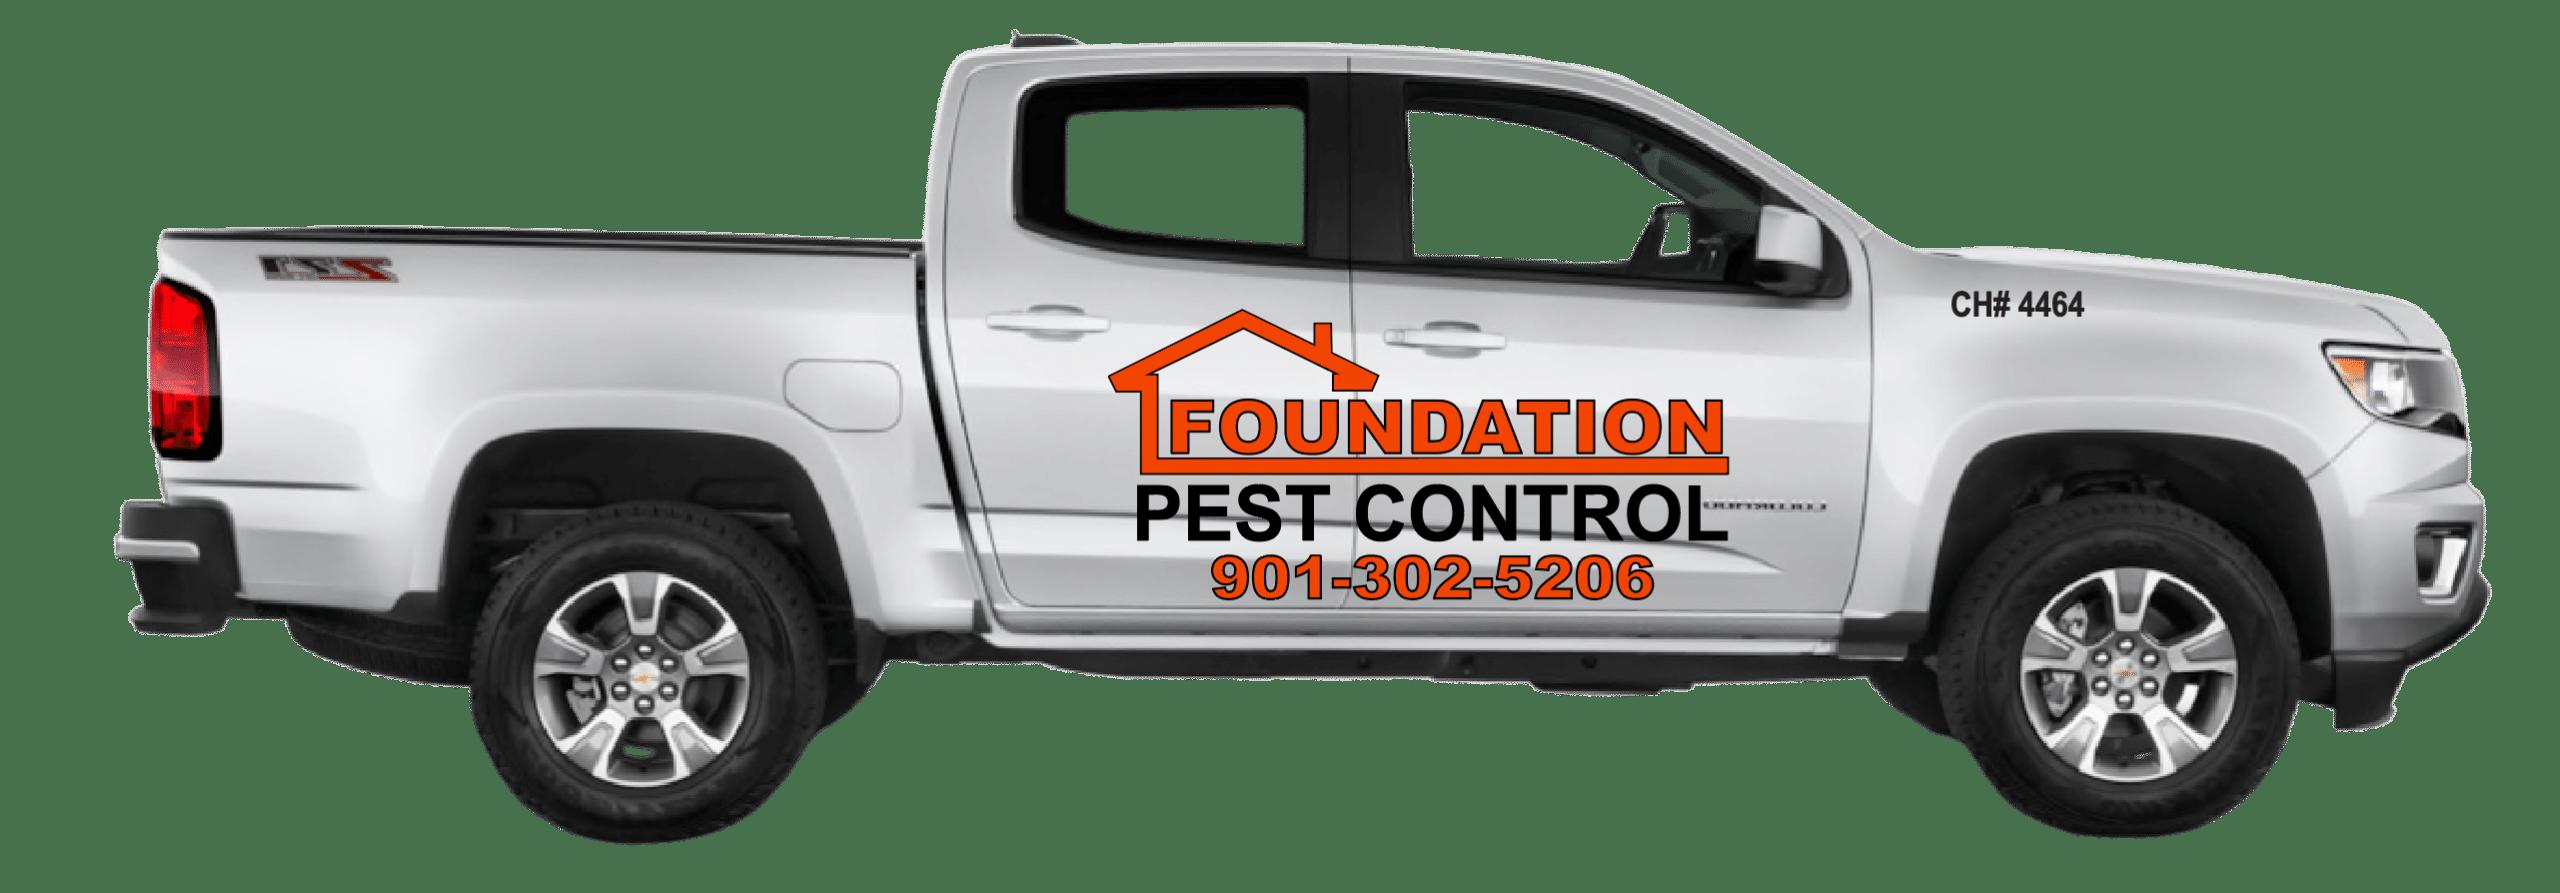 Foundation Pest Control Truck